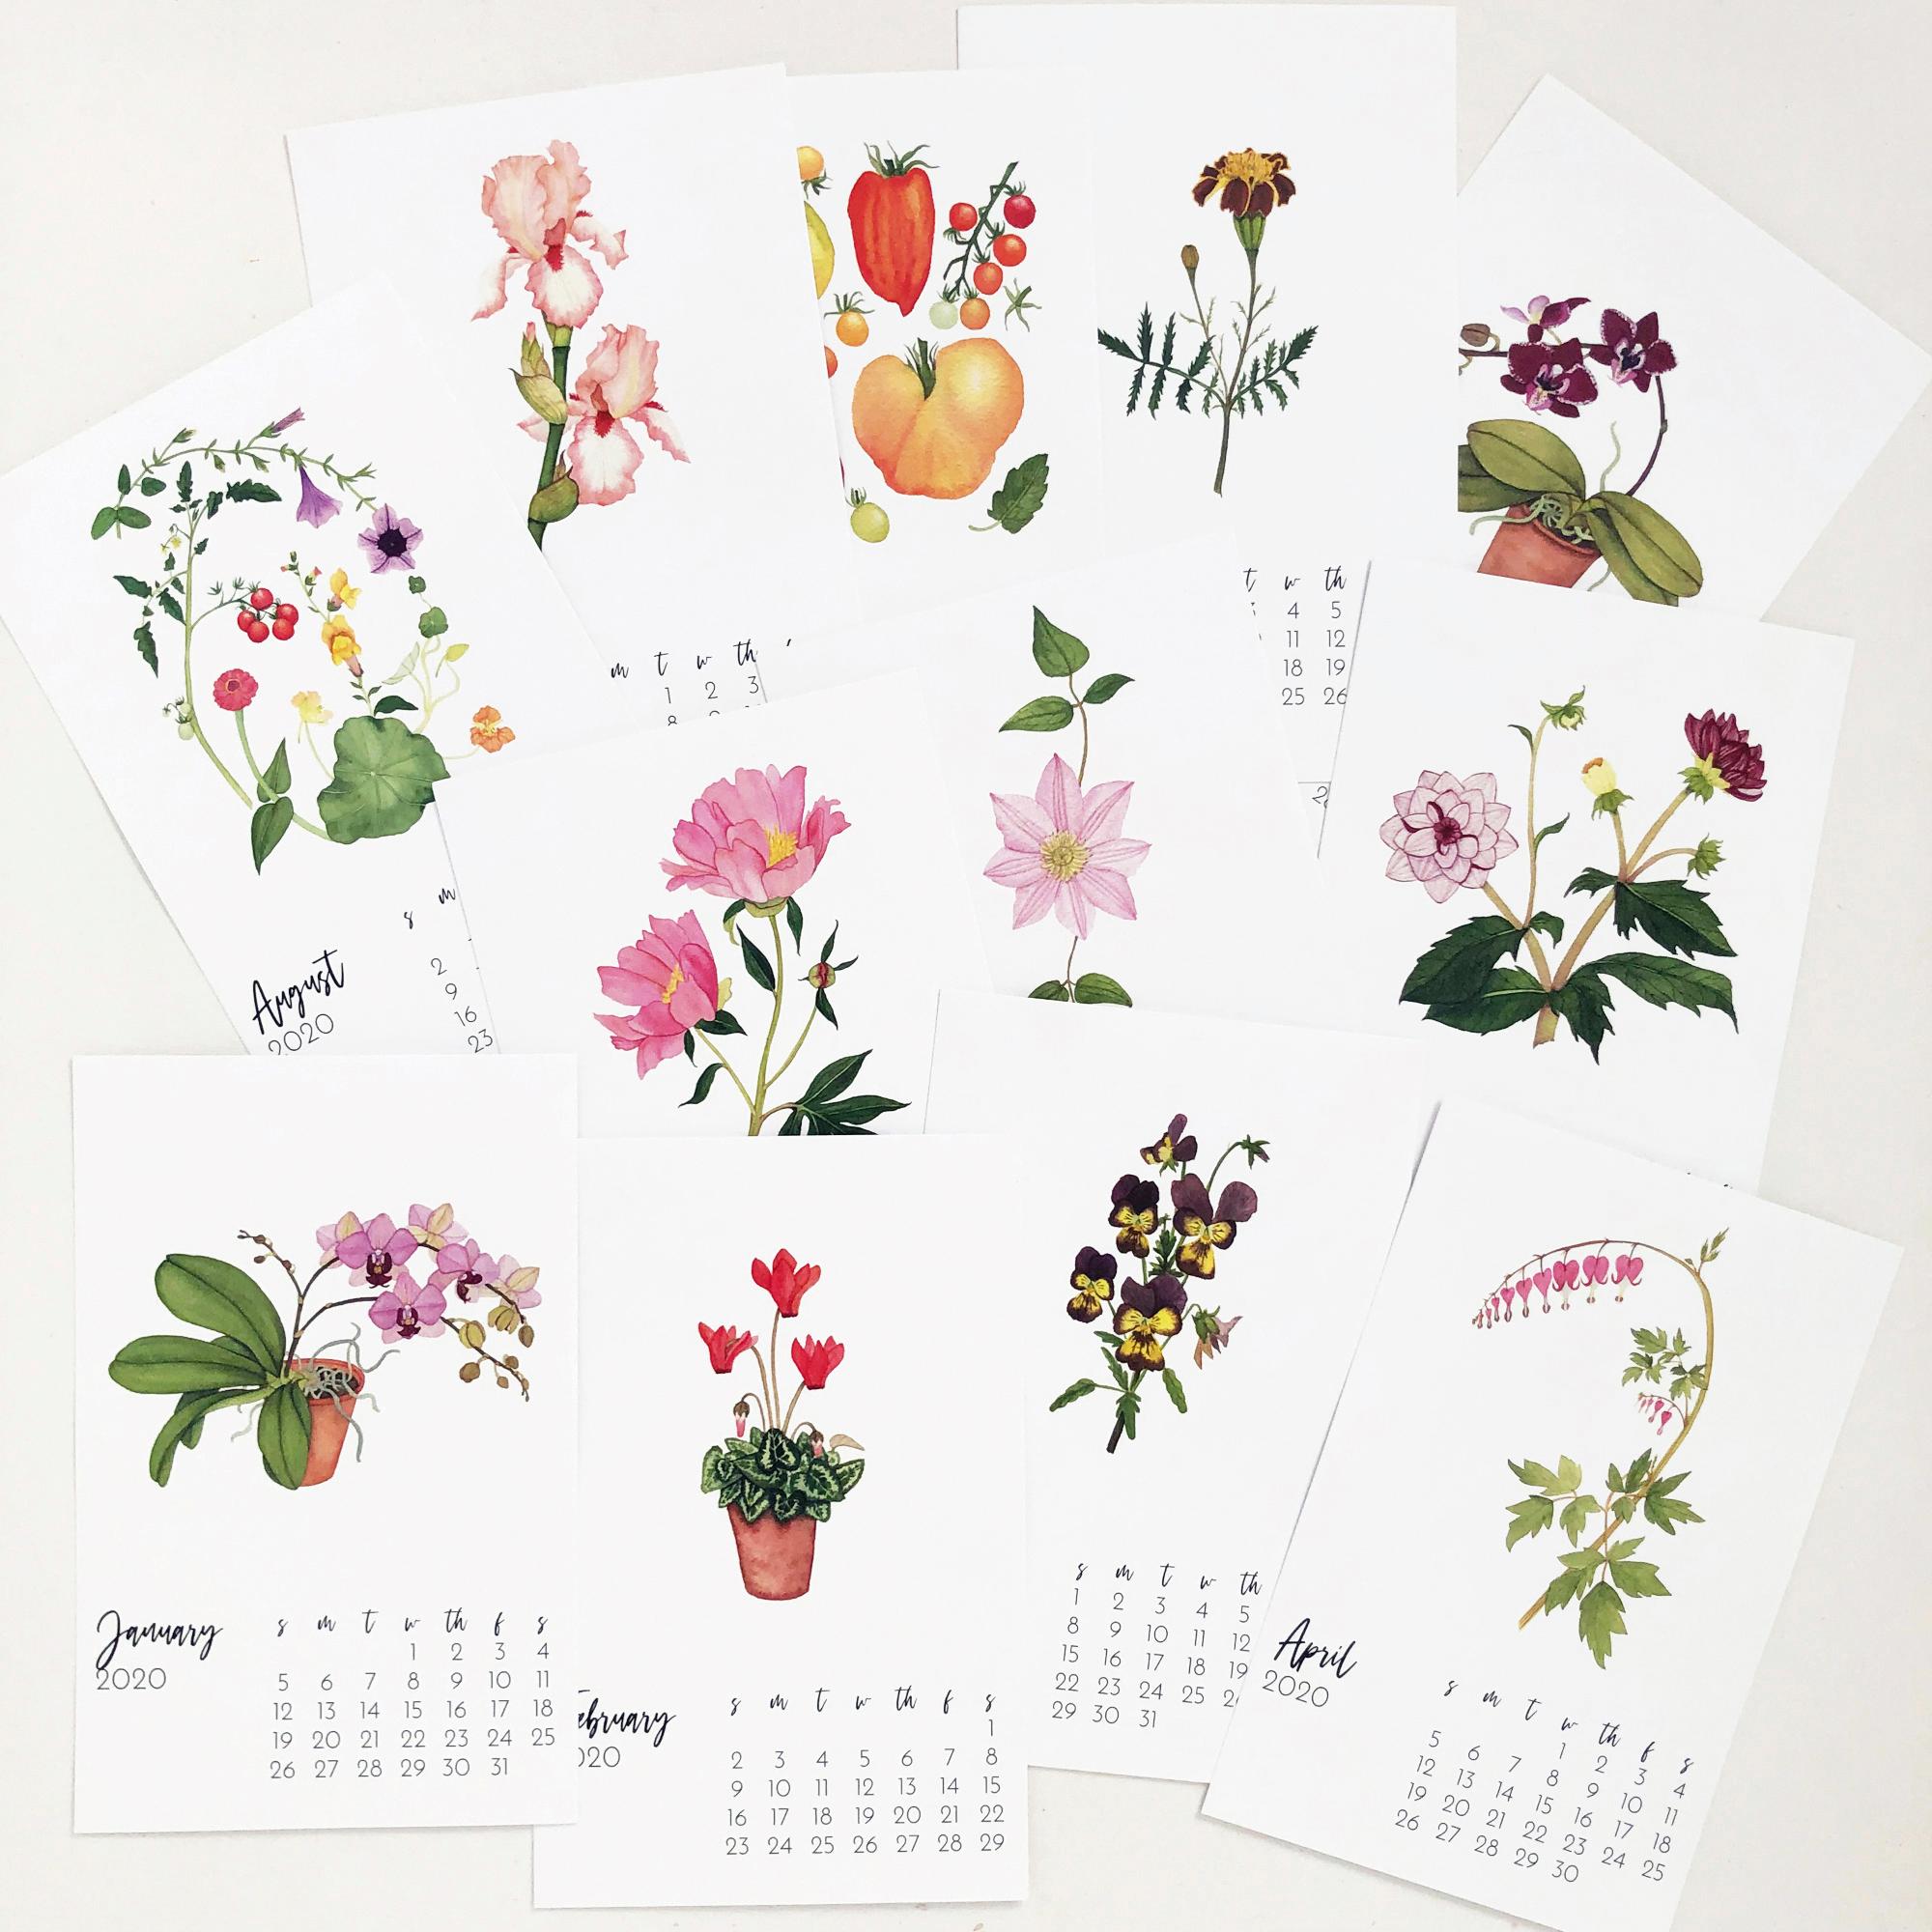 2020 Botanical Watercolor Desk Calendars by Anne Butera